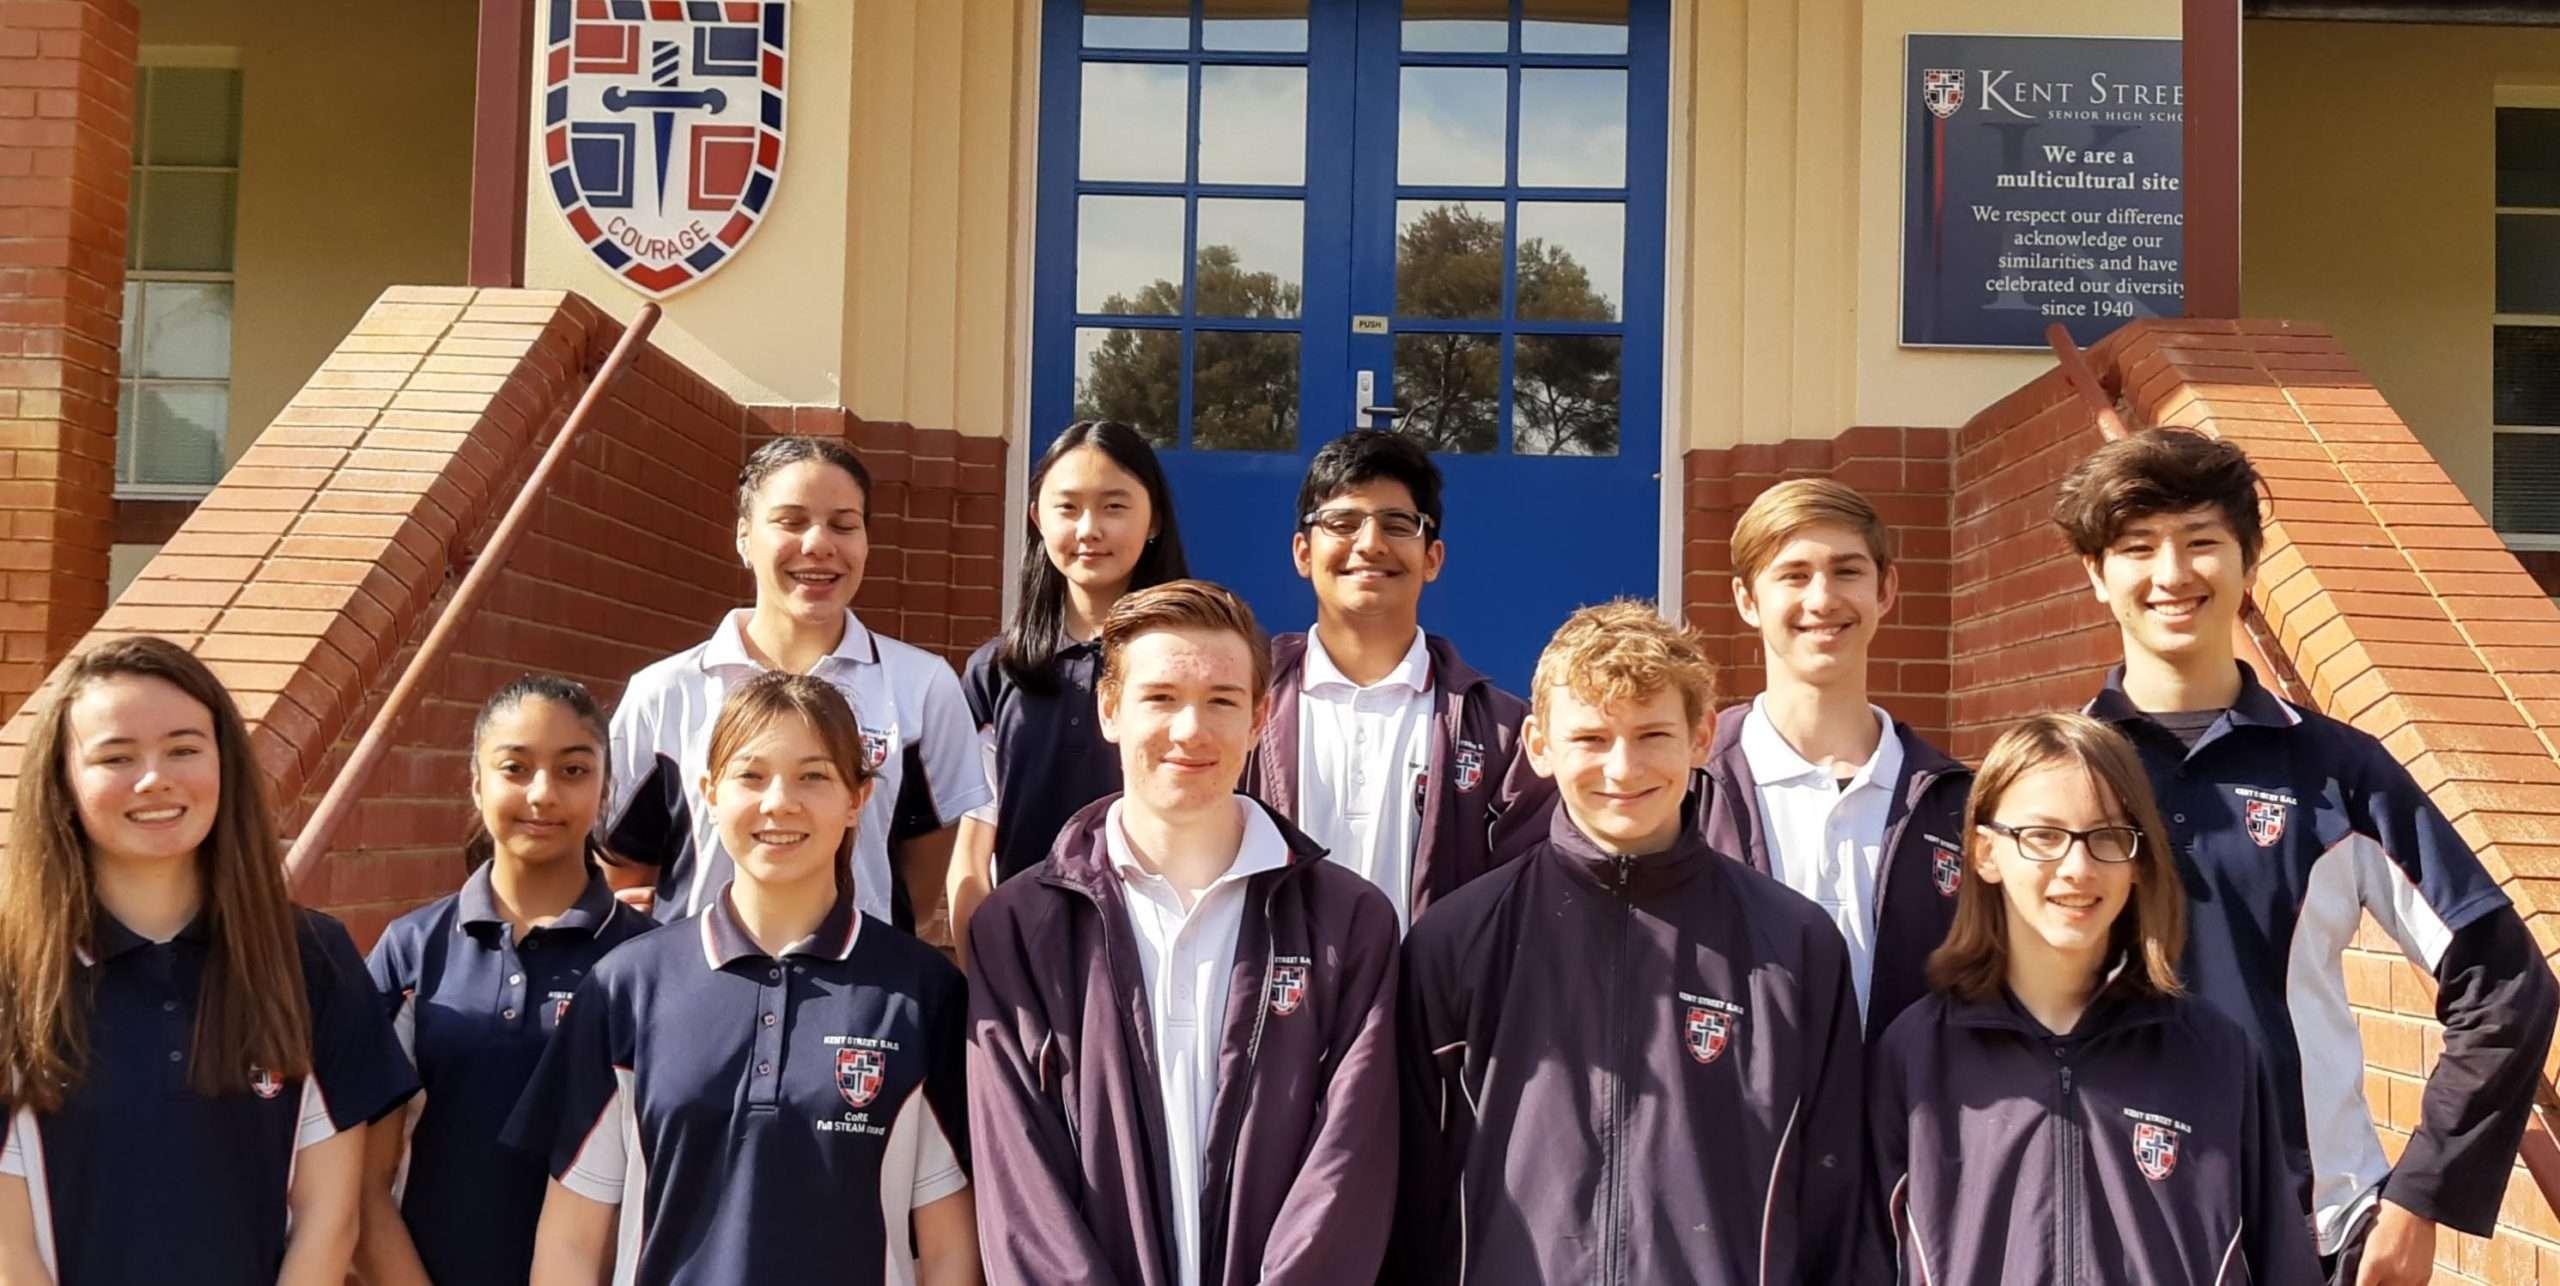 Kent St High School